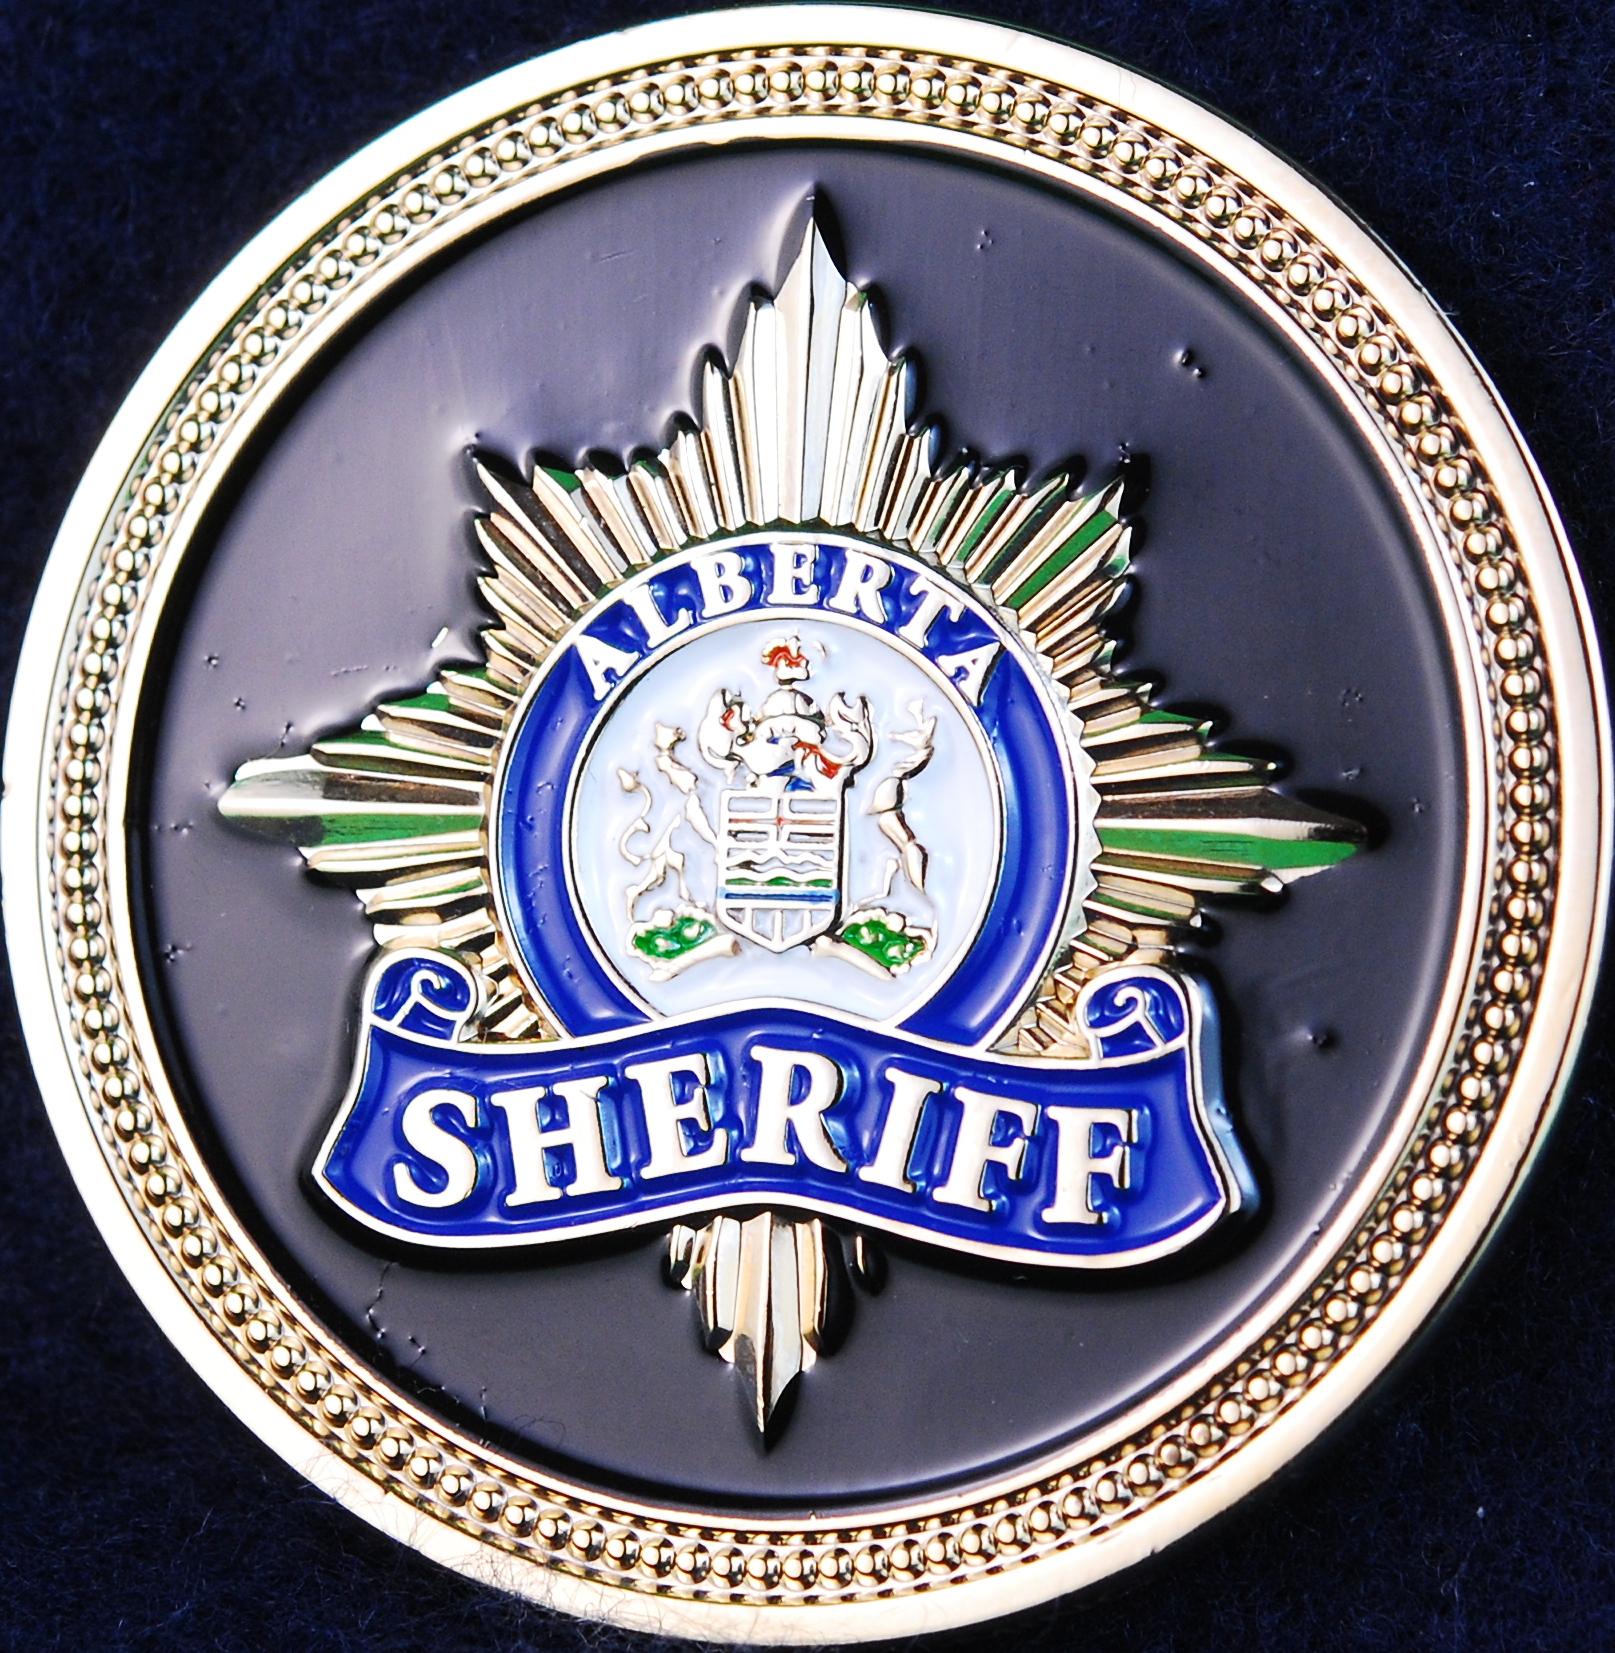 Alberta Sheriff Executive Protection Unit   Challengecoins ca